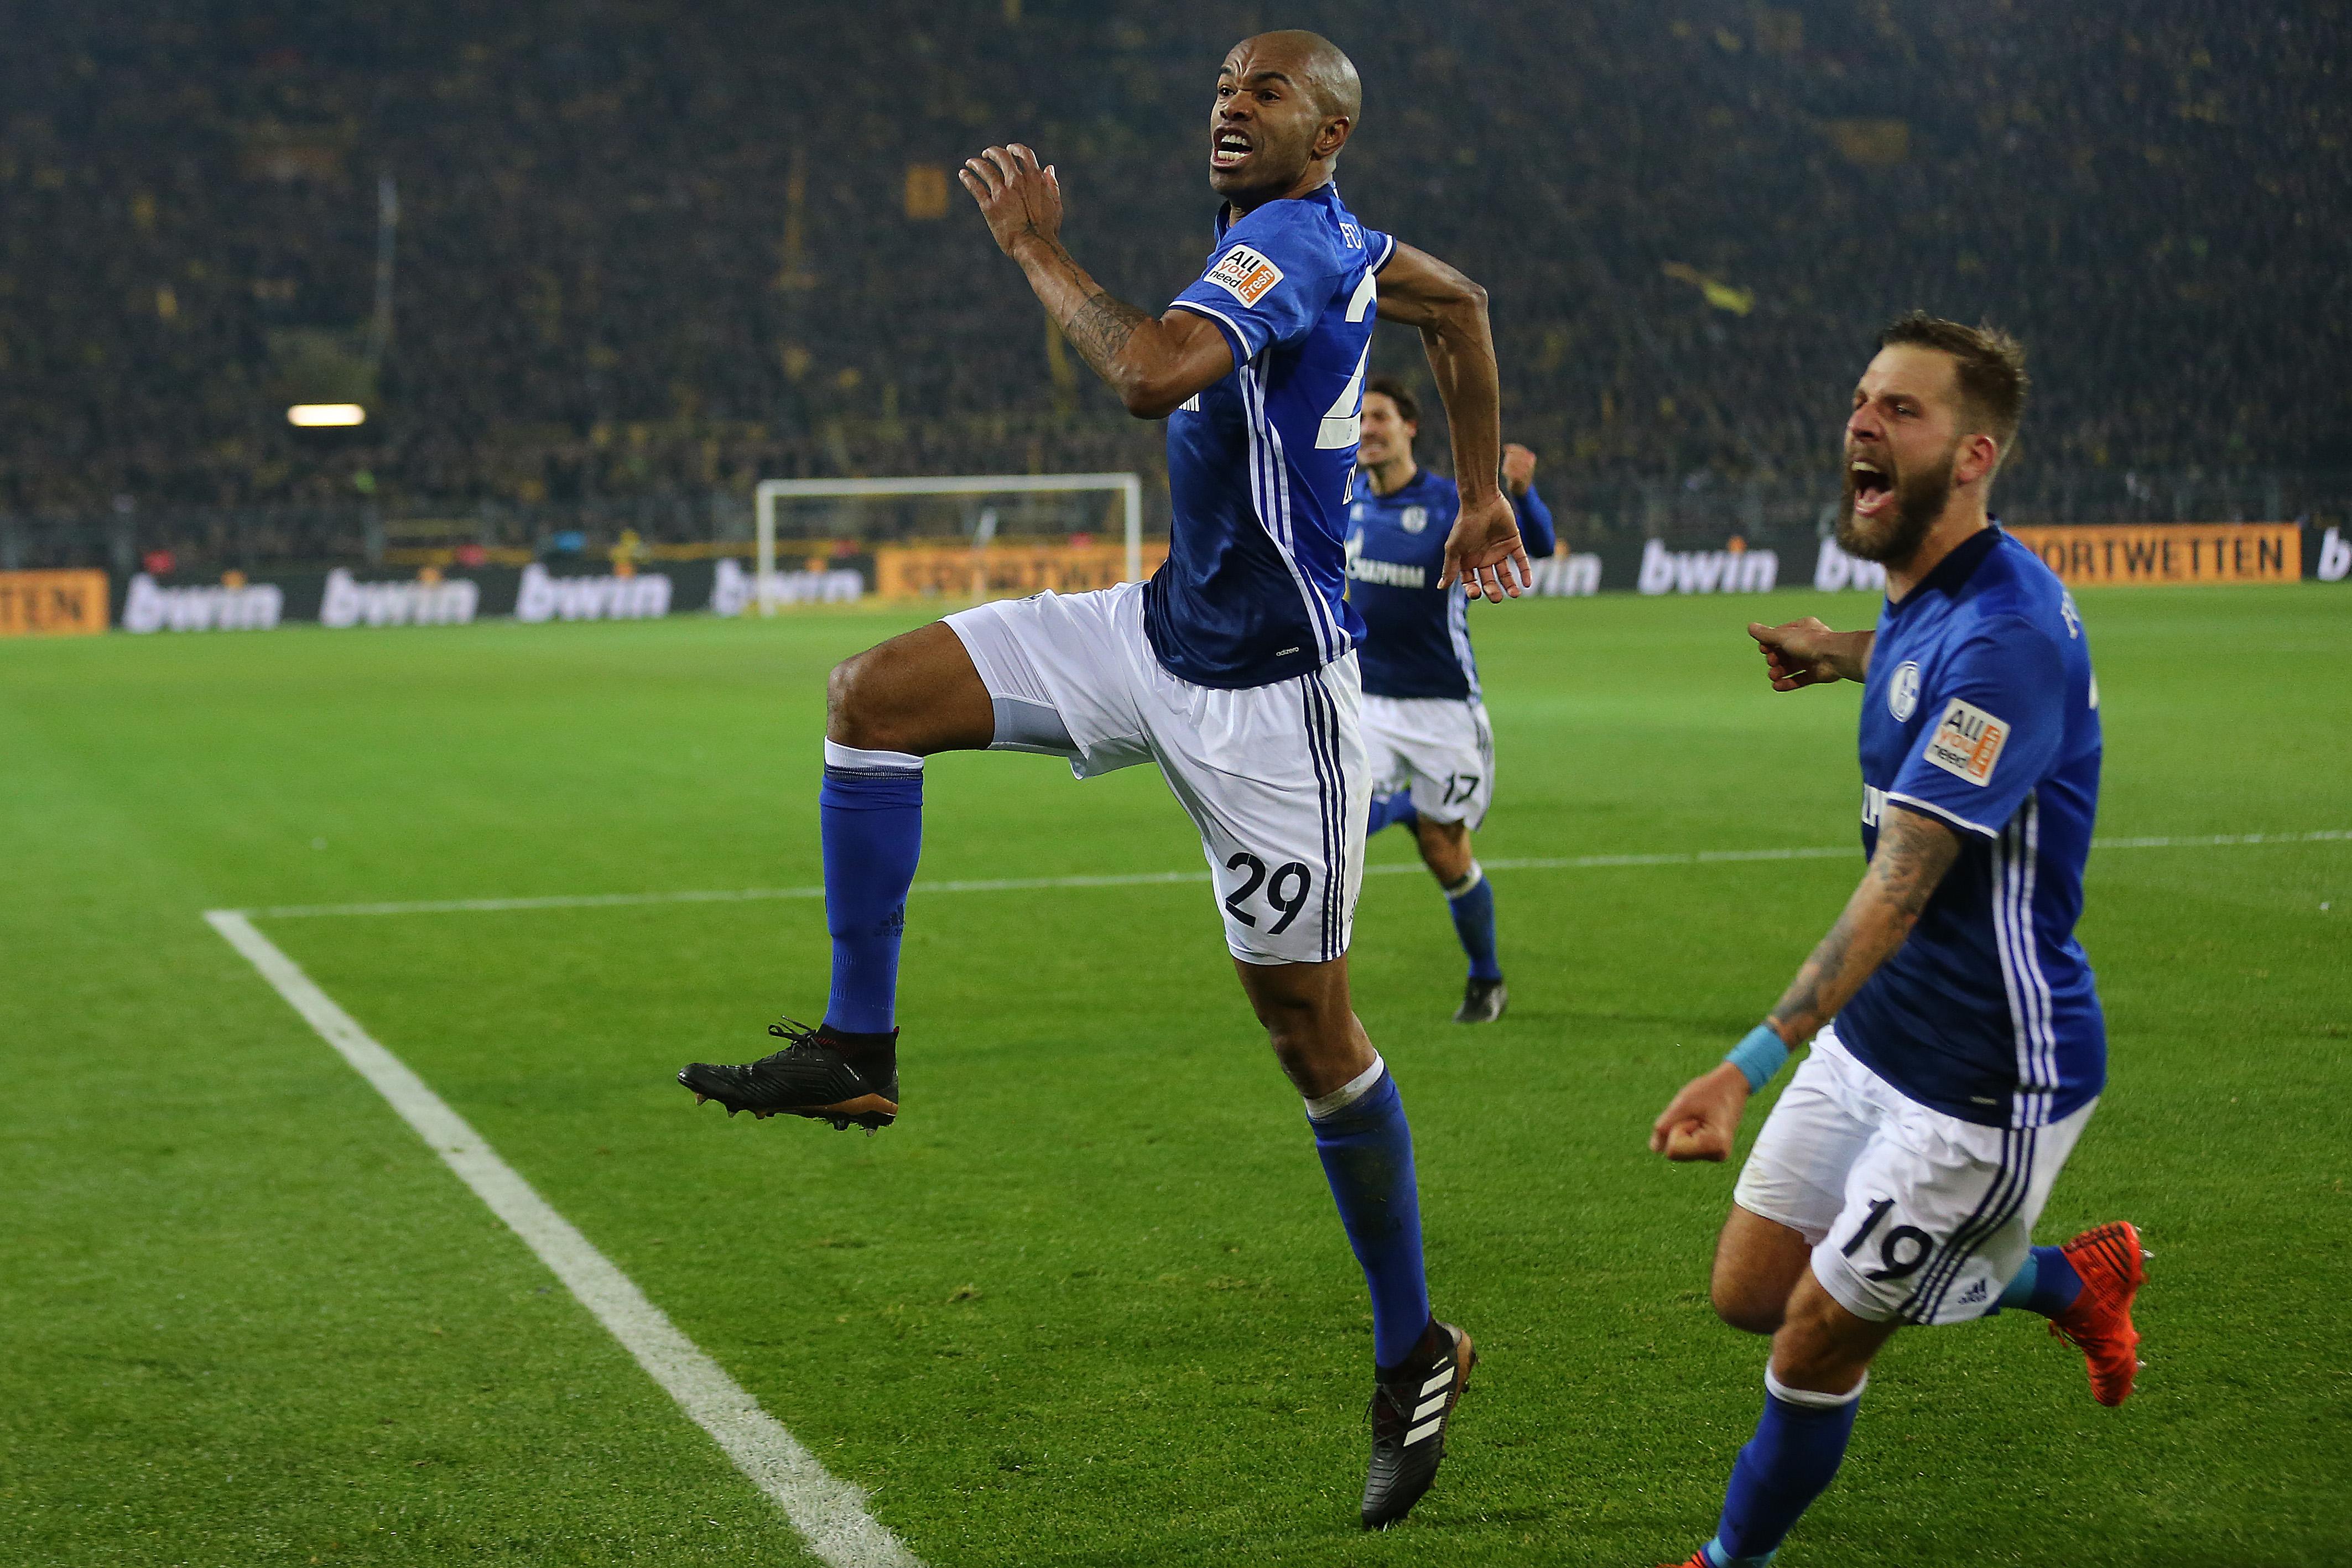 Dortmund Schalke 04